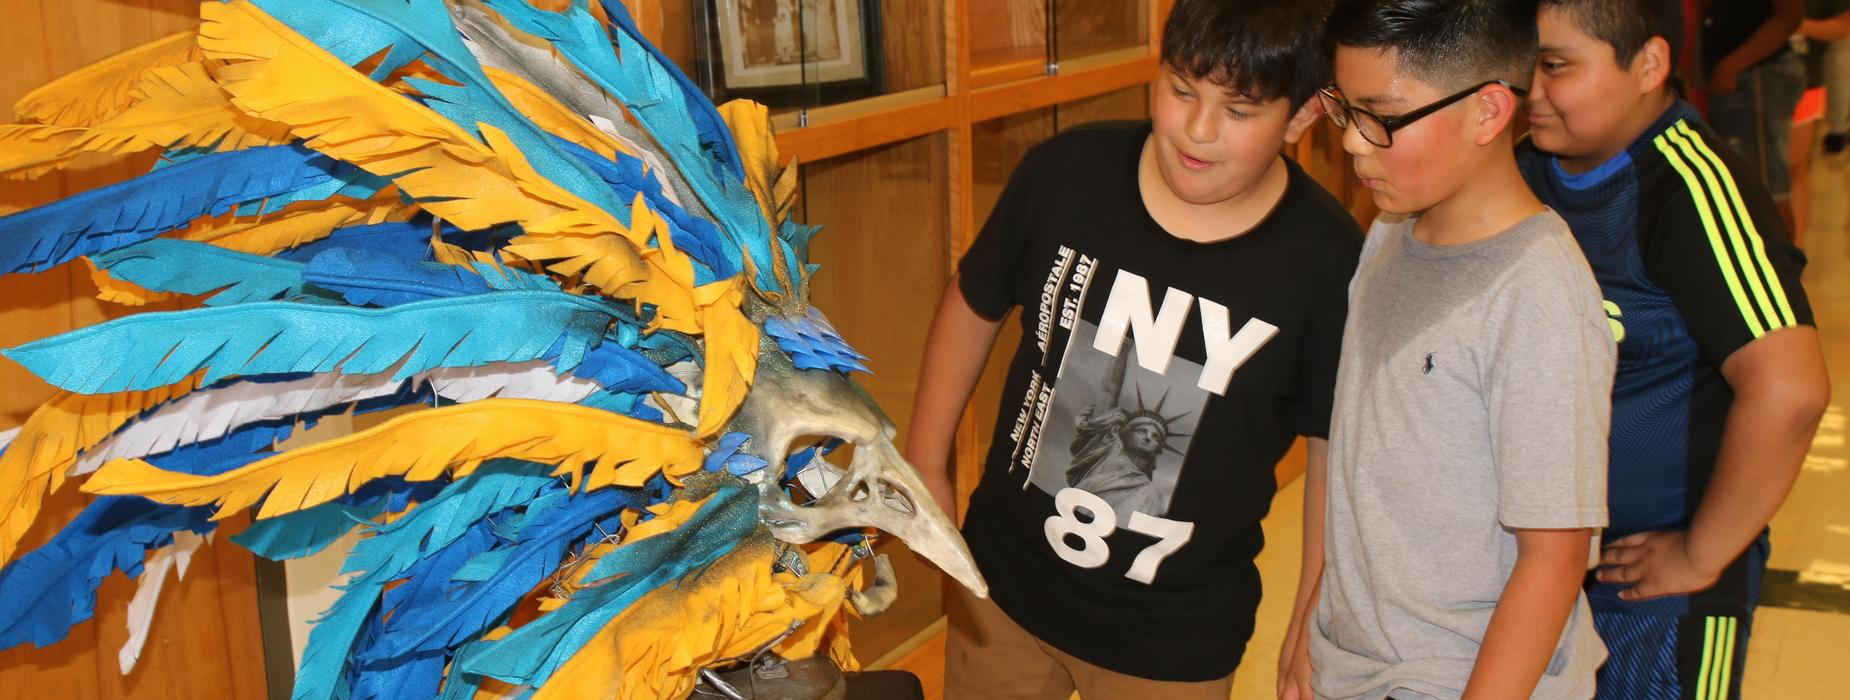 Students at museum exhibit